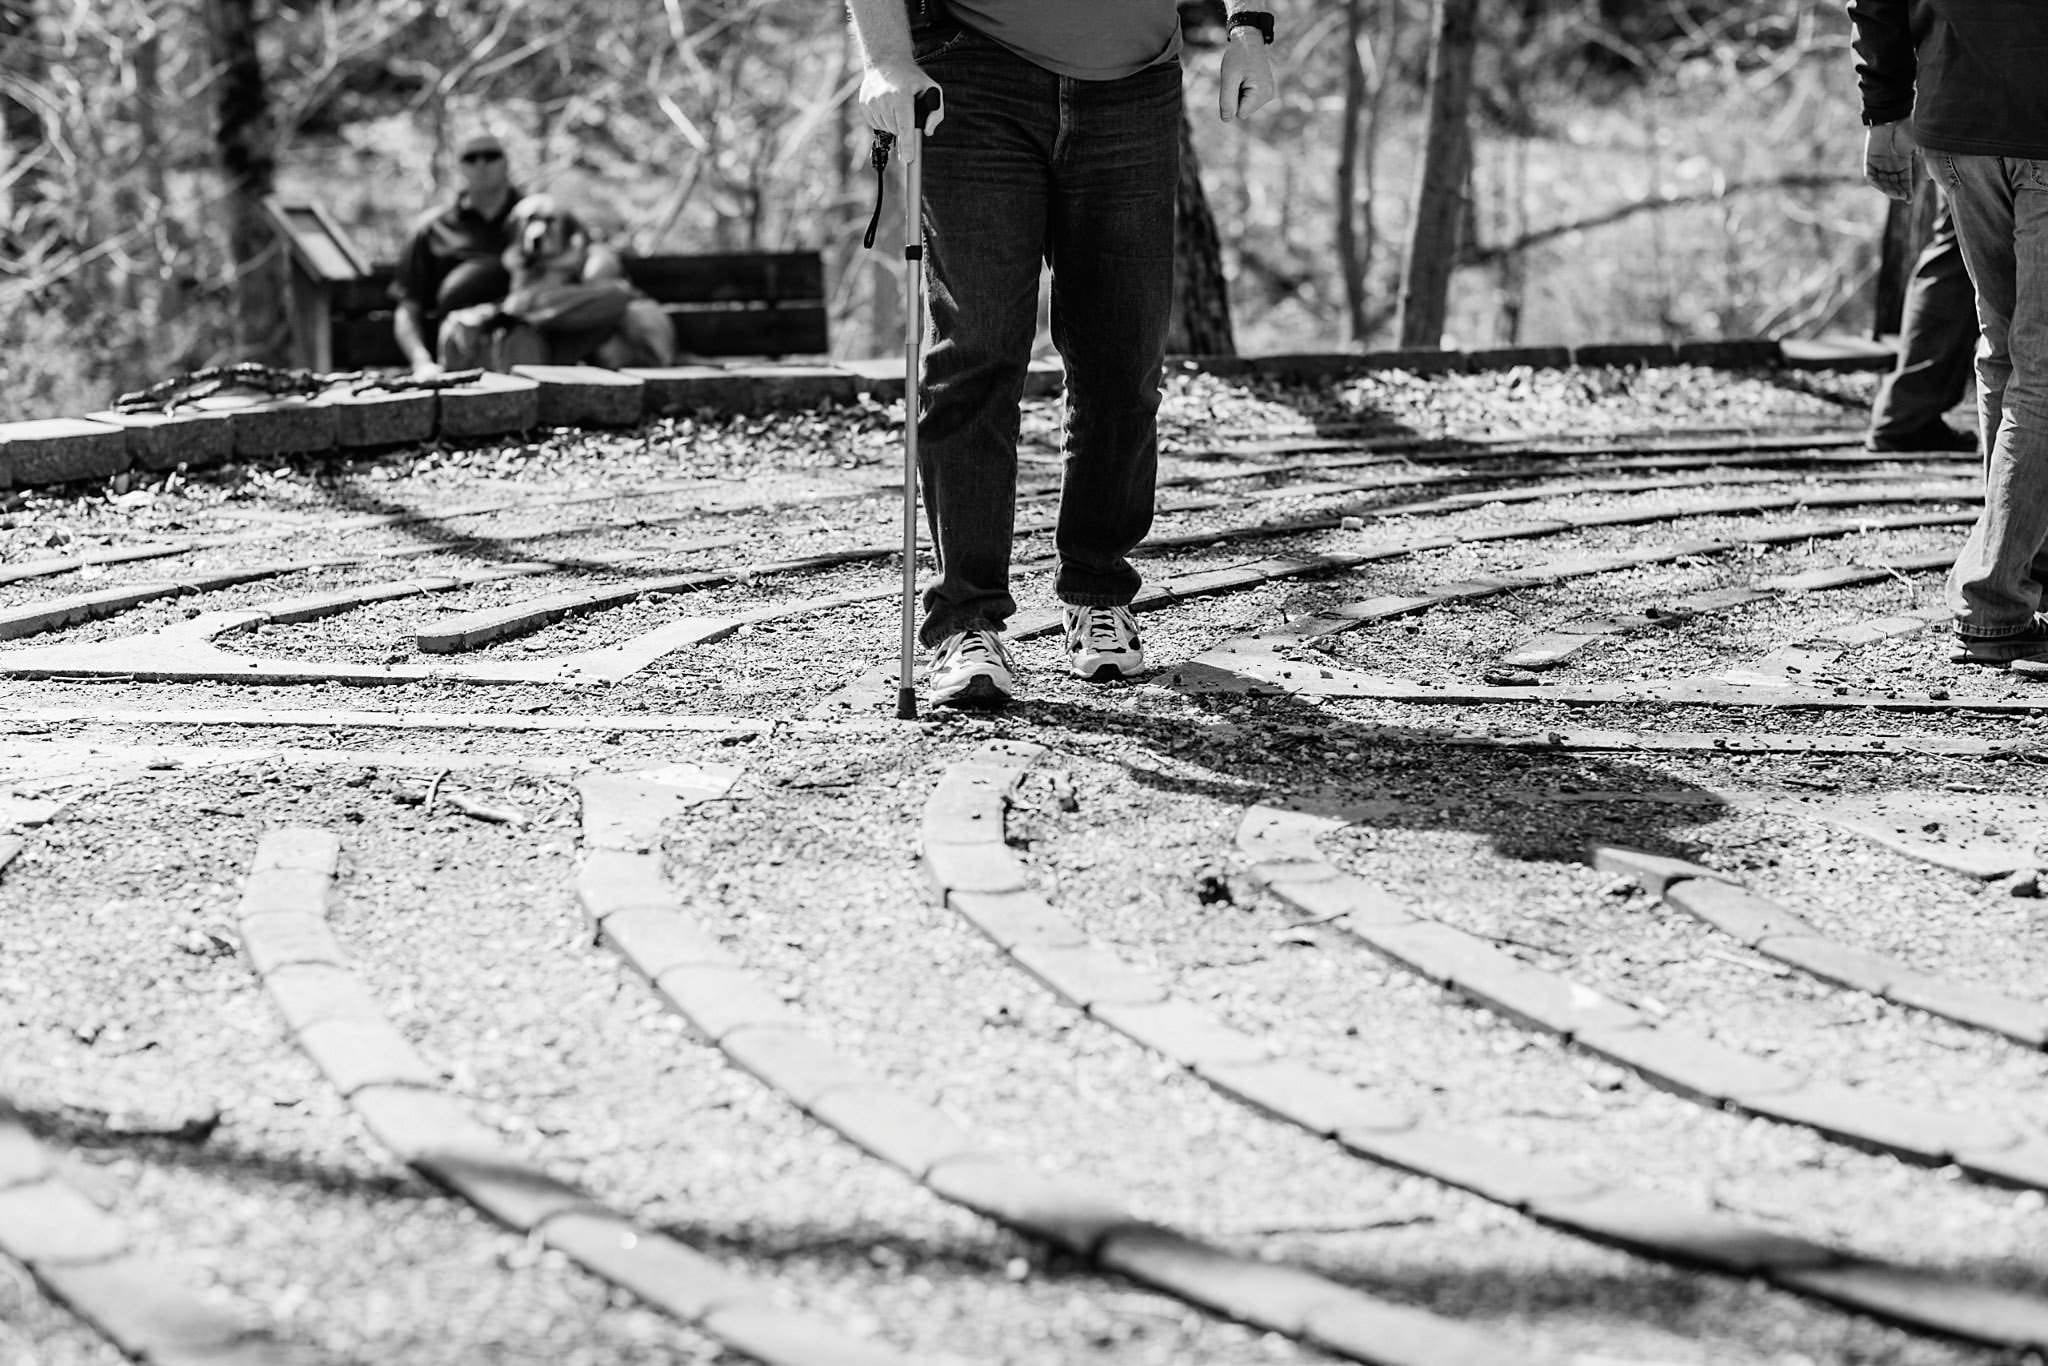 A man walking in a labyrinth